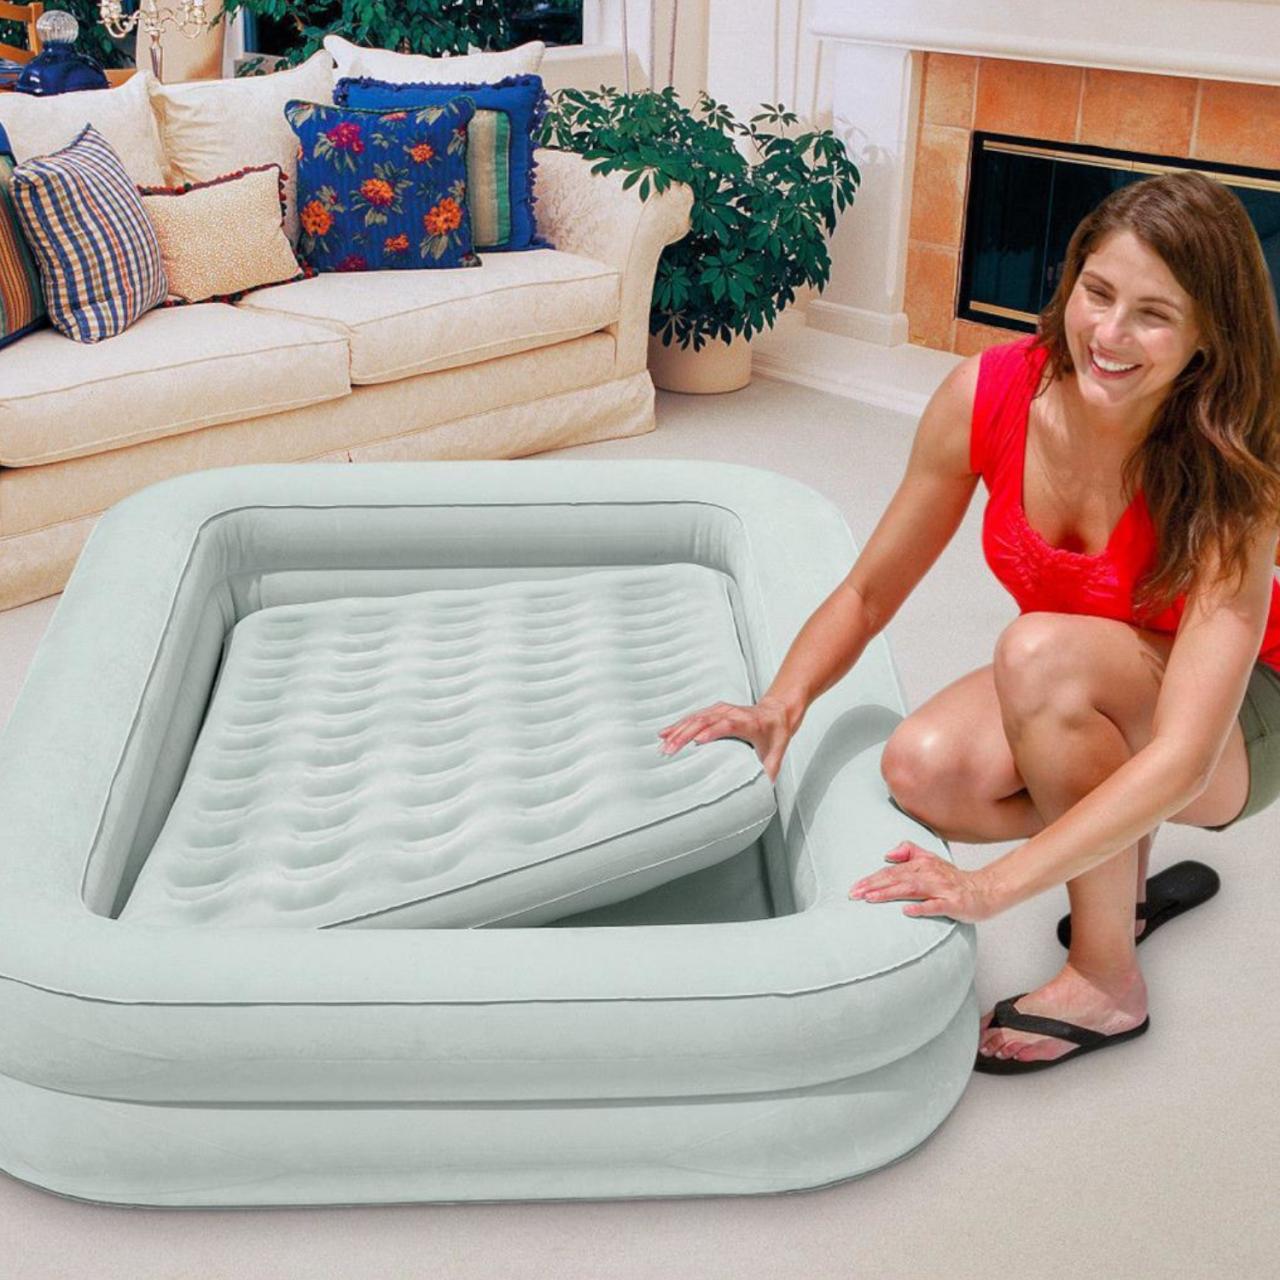 Intex Reisebett Gästebett Kinderbett Luftbett mit Handpumpe Tasche 168x107x25 cm